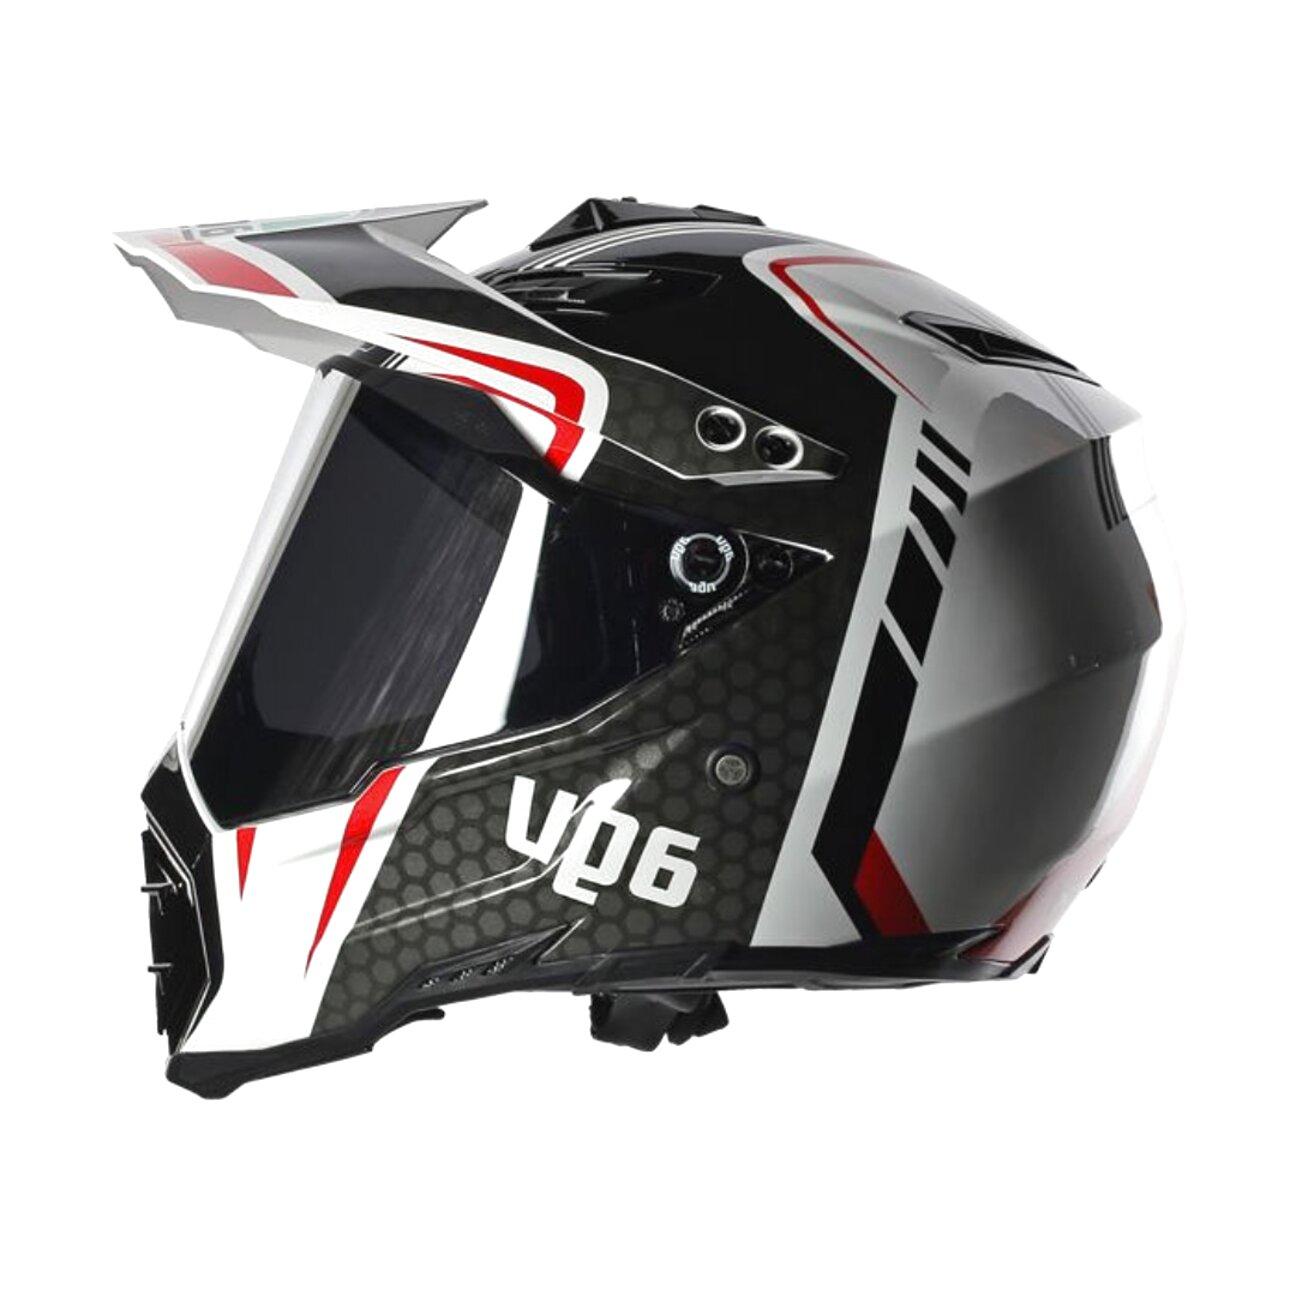 AGV AX-8 EVO Naked Karakum Helmet Review at RevZilla.com